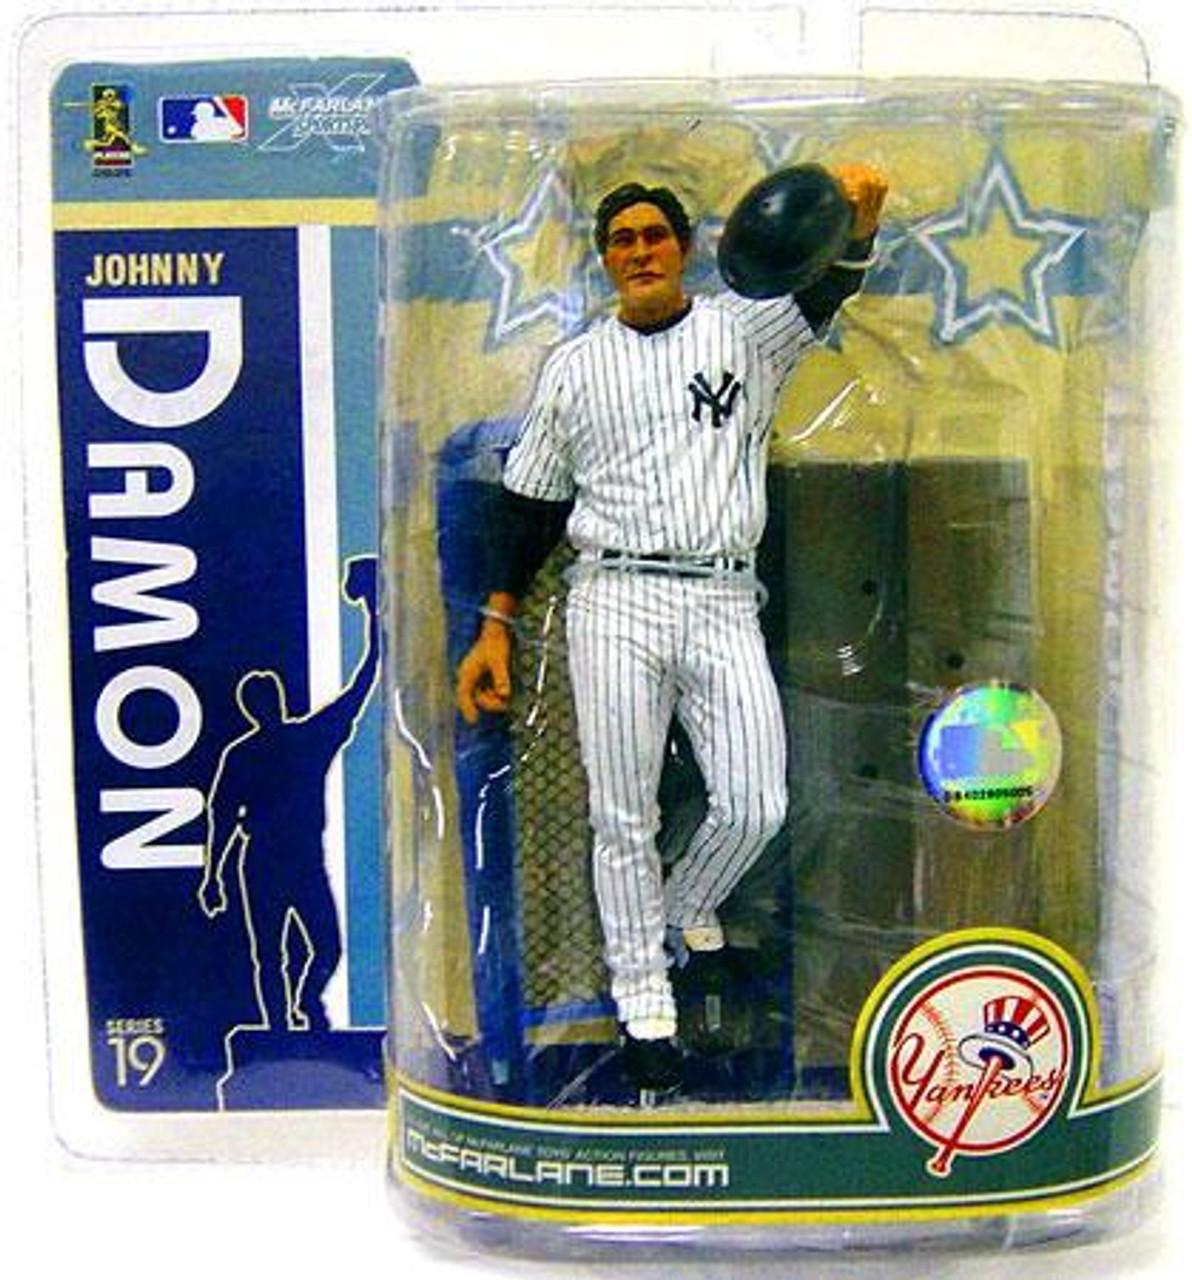 McFarlane Toys MLB New York Yankees Sports Picks Series 19 Johnny Damon Action Figure [White Jersey]